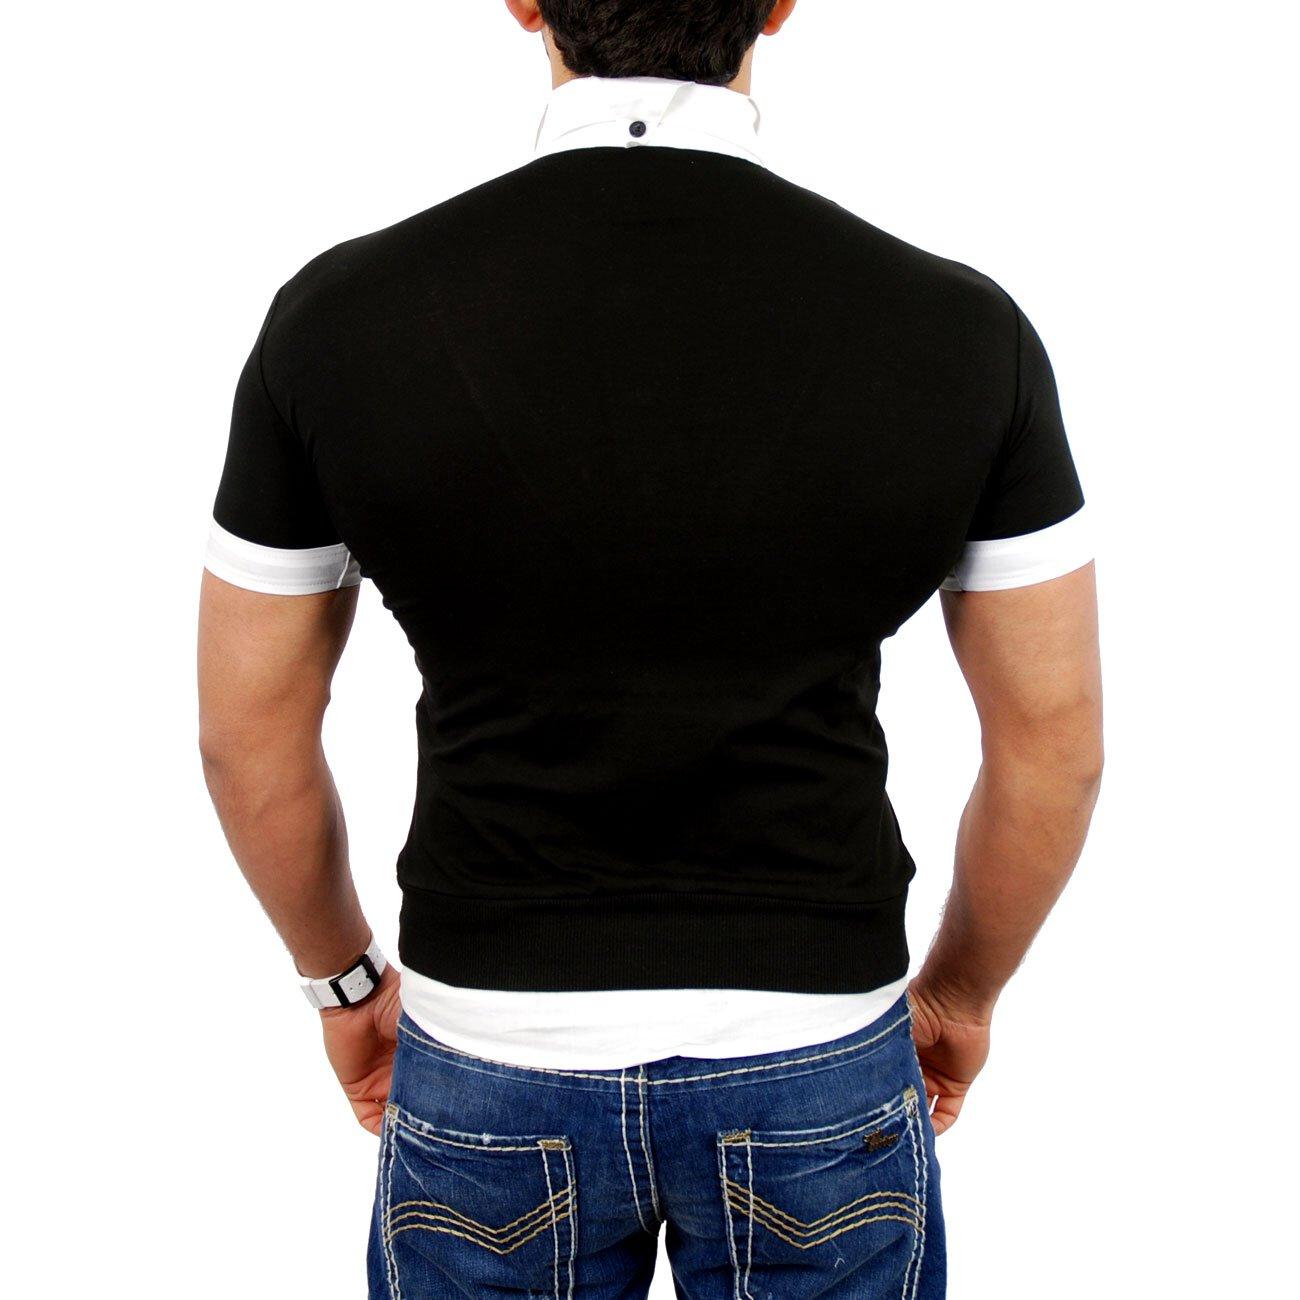 tazzio t shirt herren 2in1 layer style kurzarm shirt tz 903. Black Bedroom Furniture Sets. Home Design Ideas